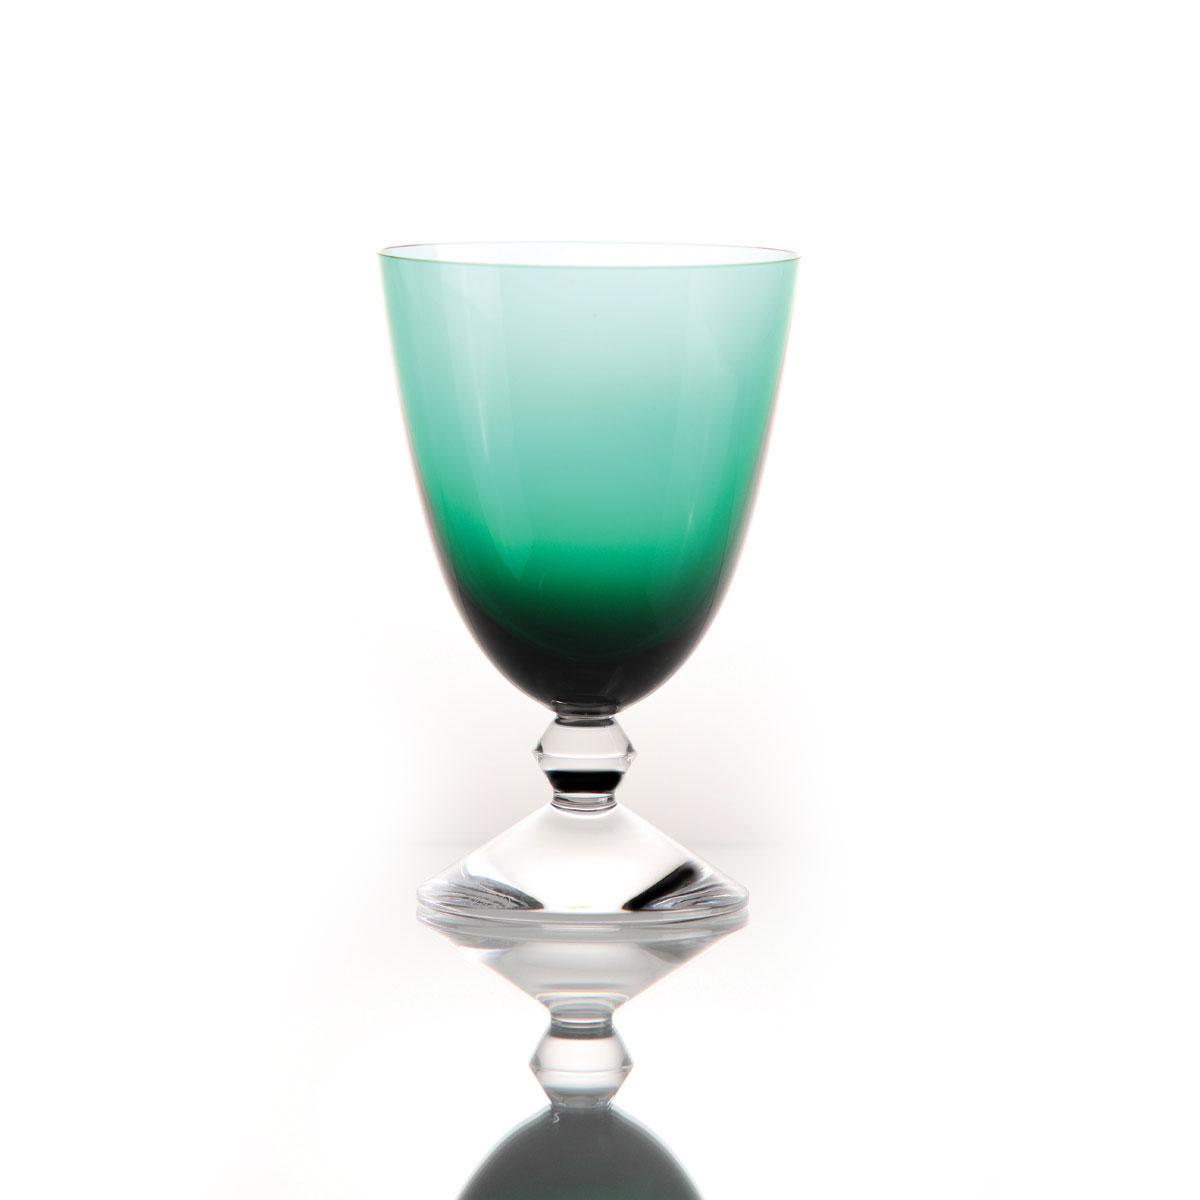 Baccarat Crystal, Vega Water Glass Emerald Green, Single